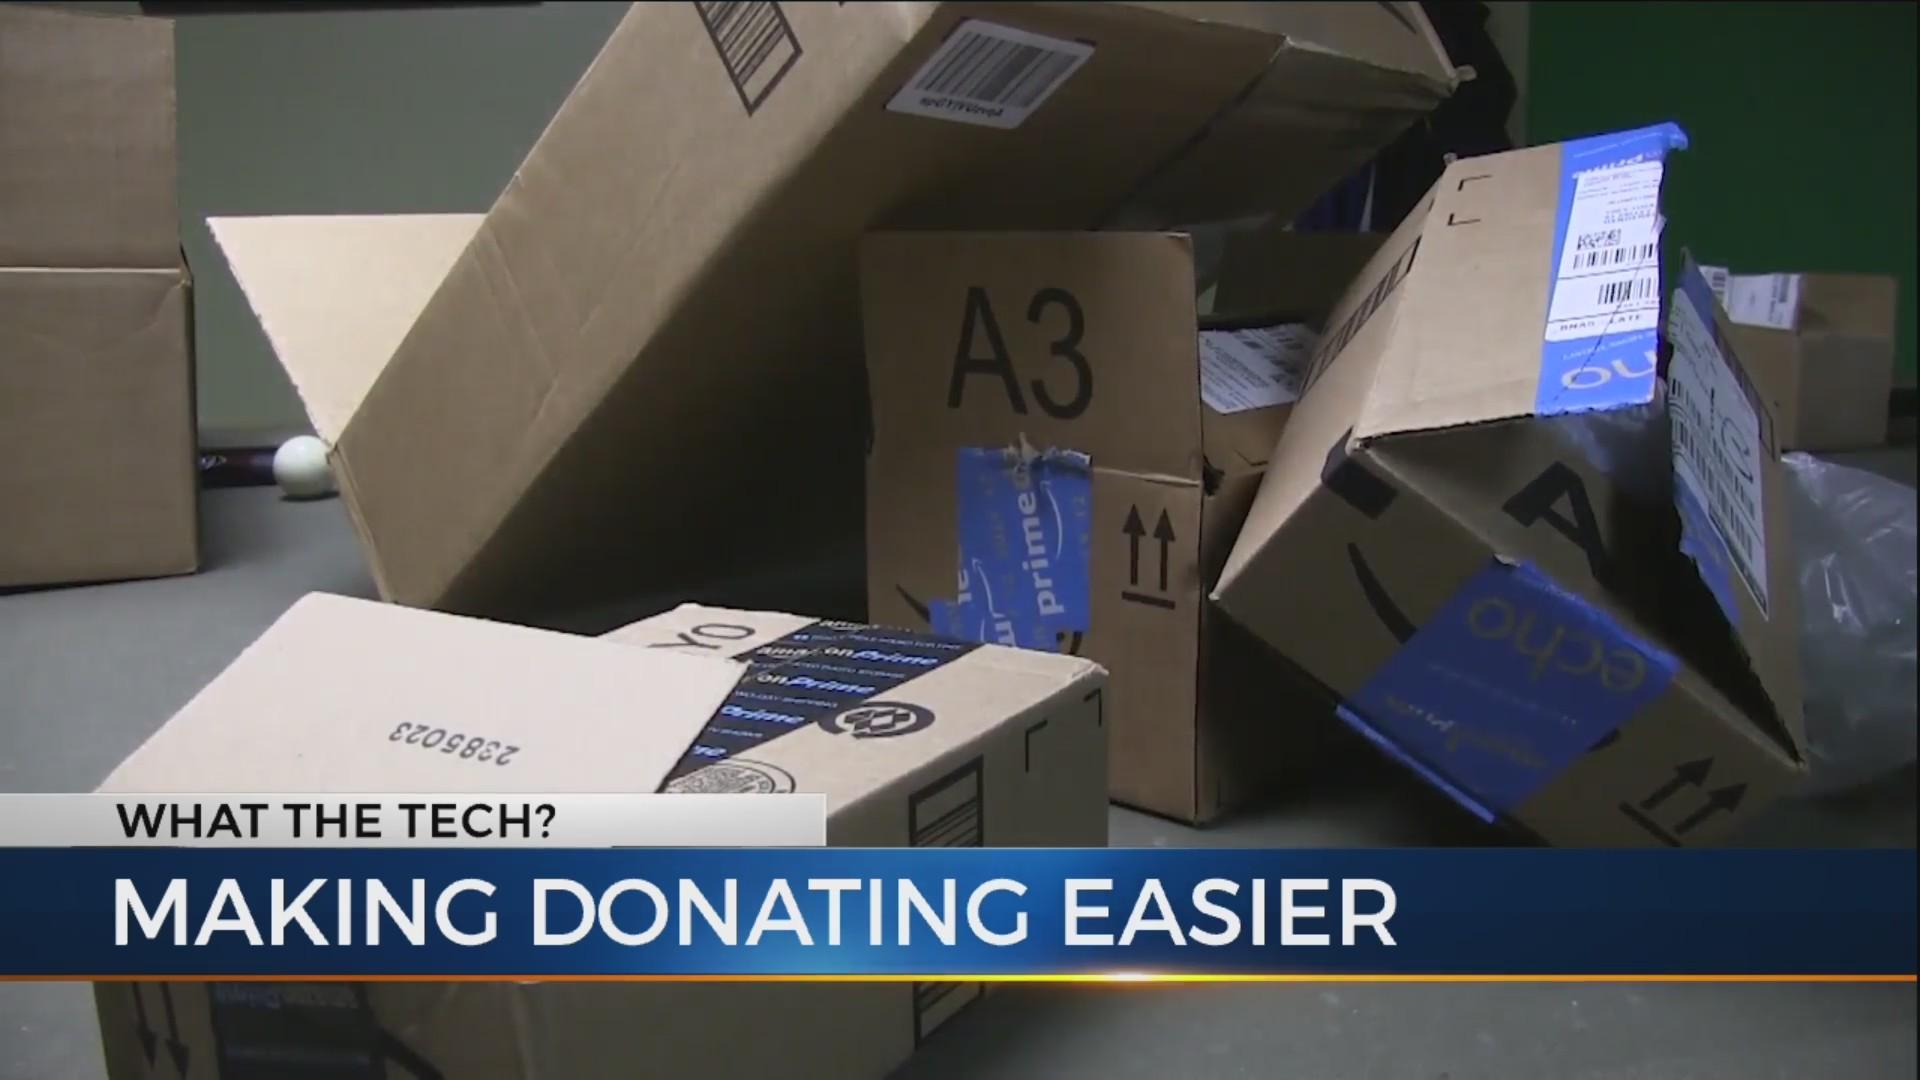 Amazon_boxes_make_donating_easy_0_20181124122851